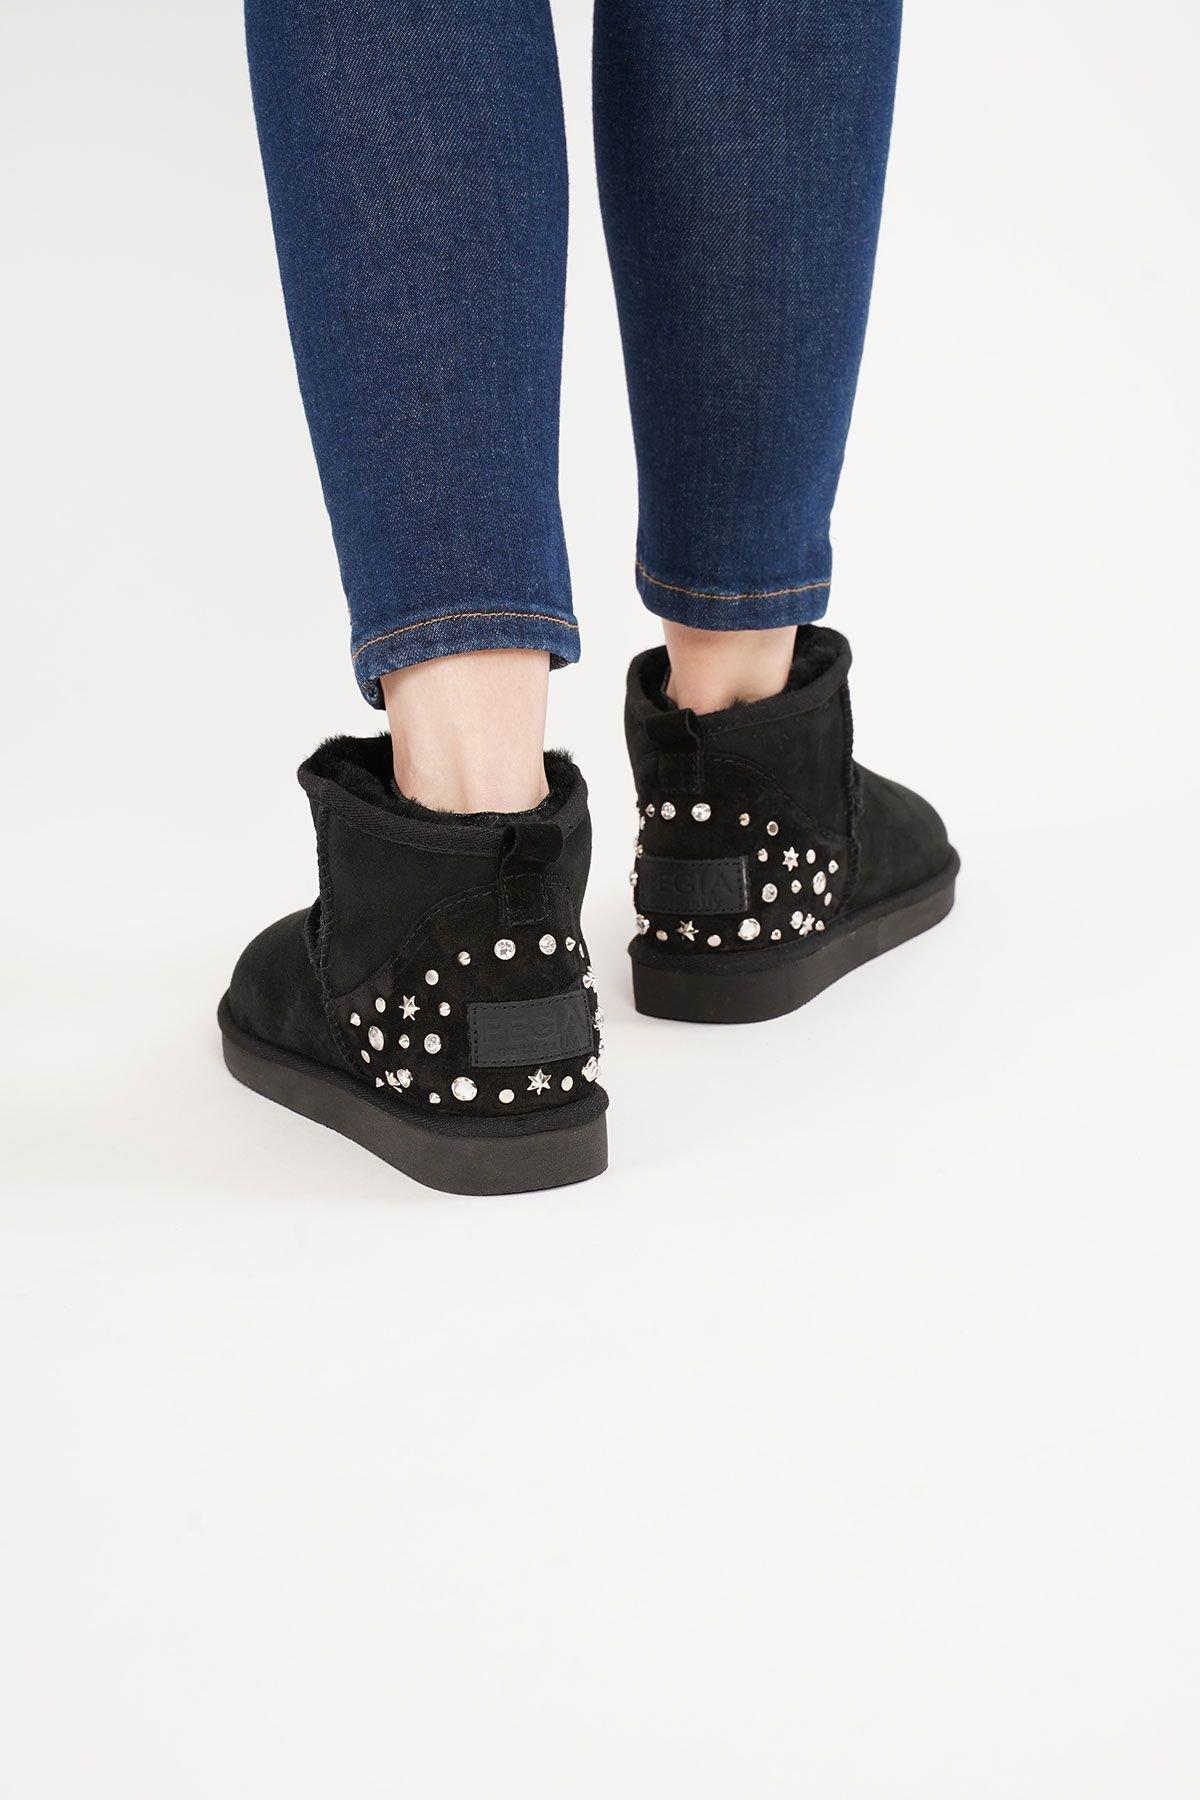 Pegia Heel Detailed Women's Mini Boots 191132 Black